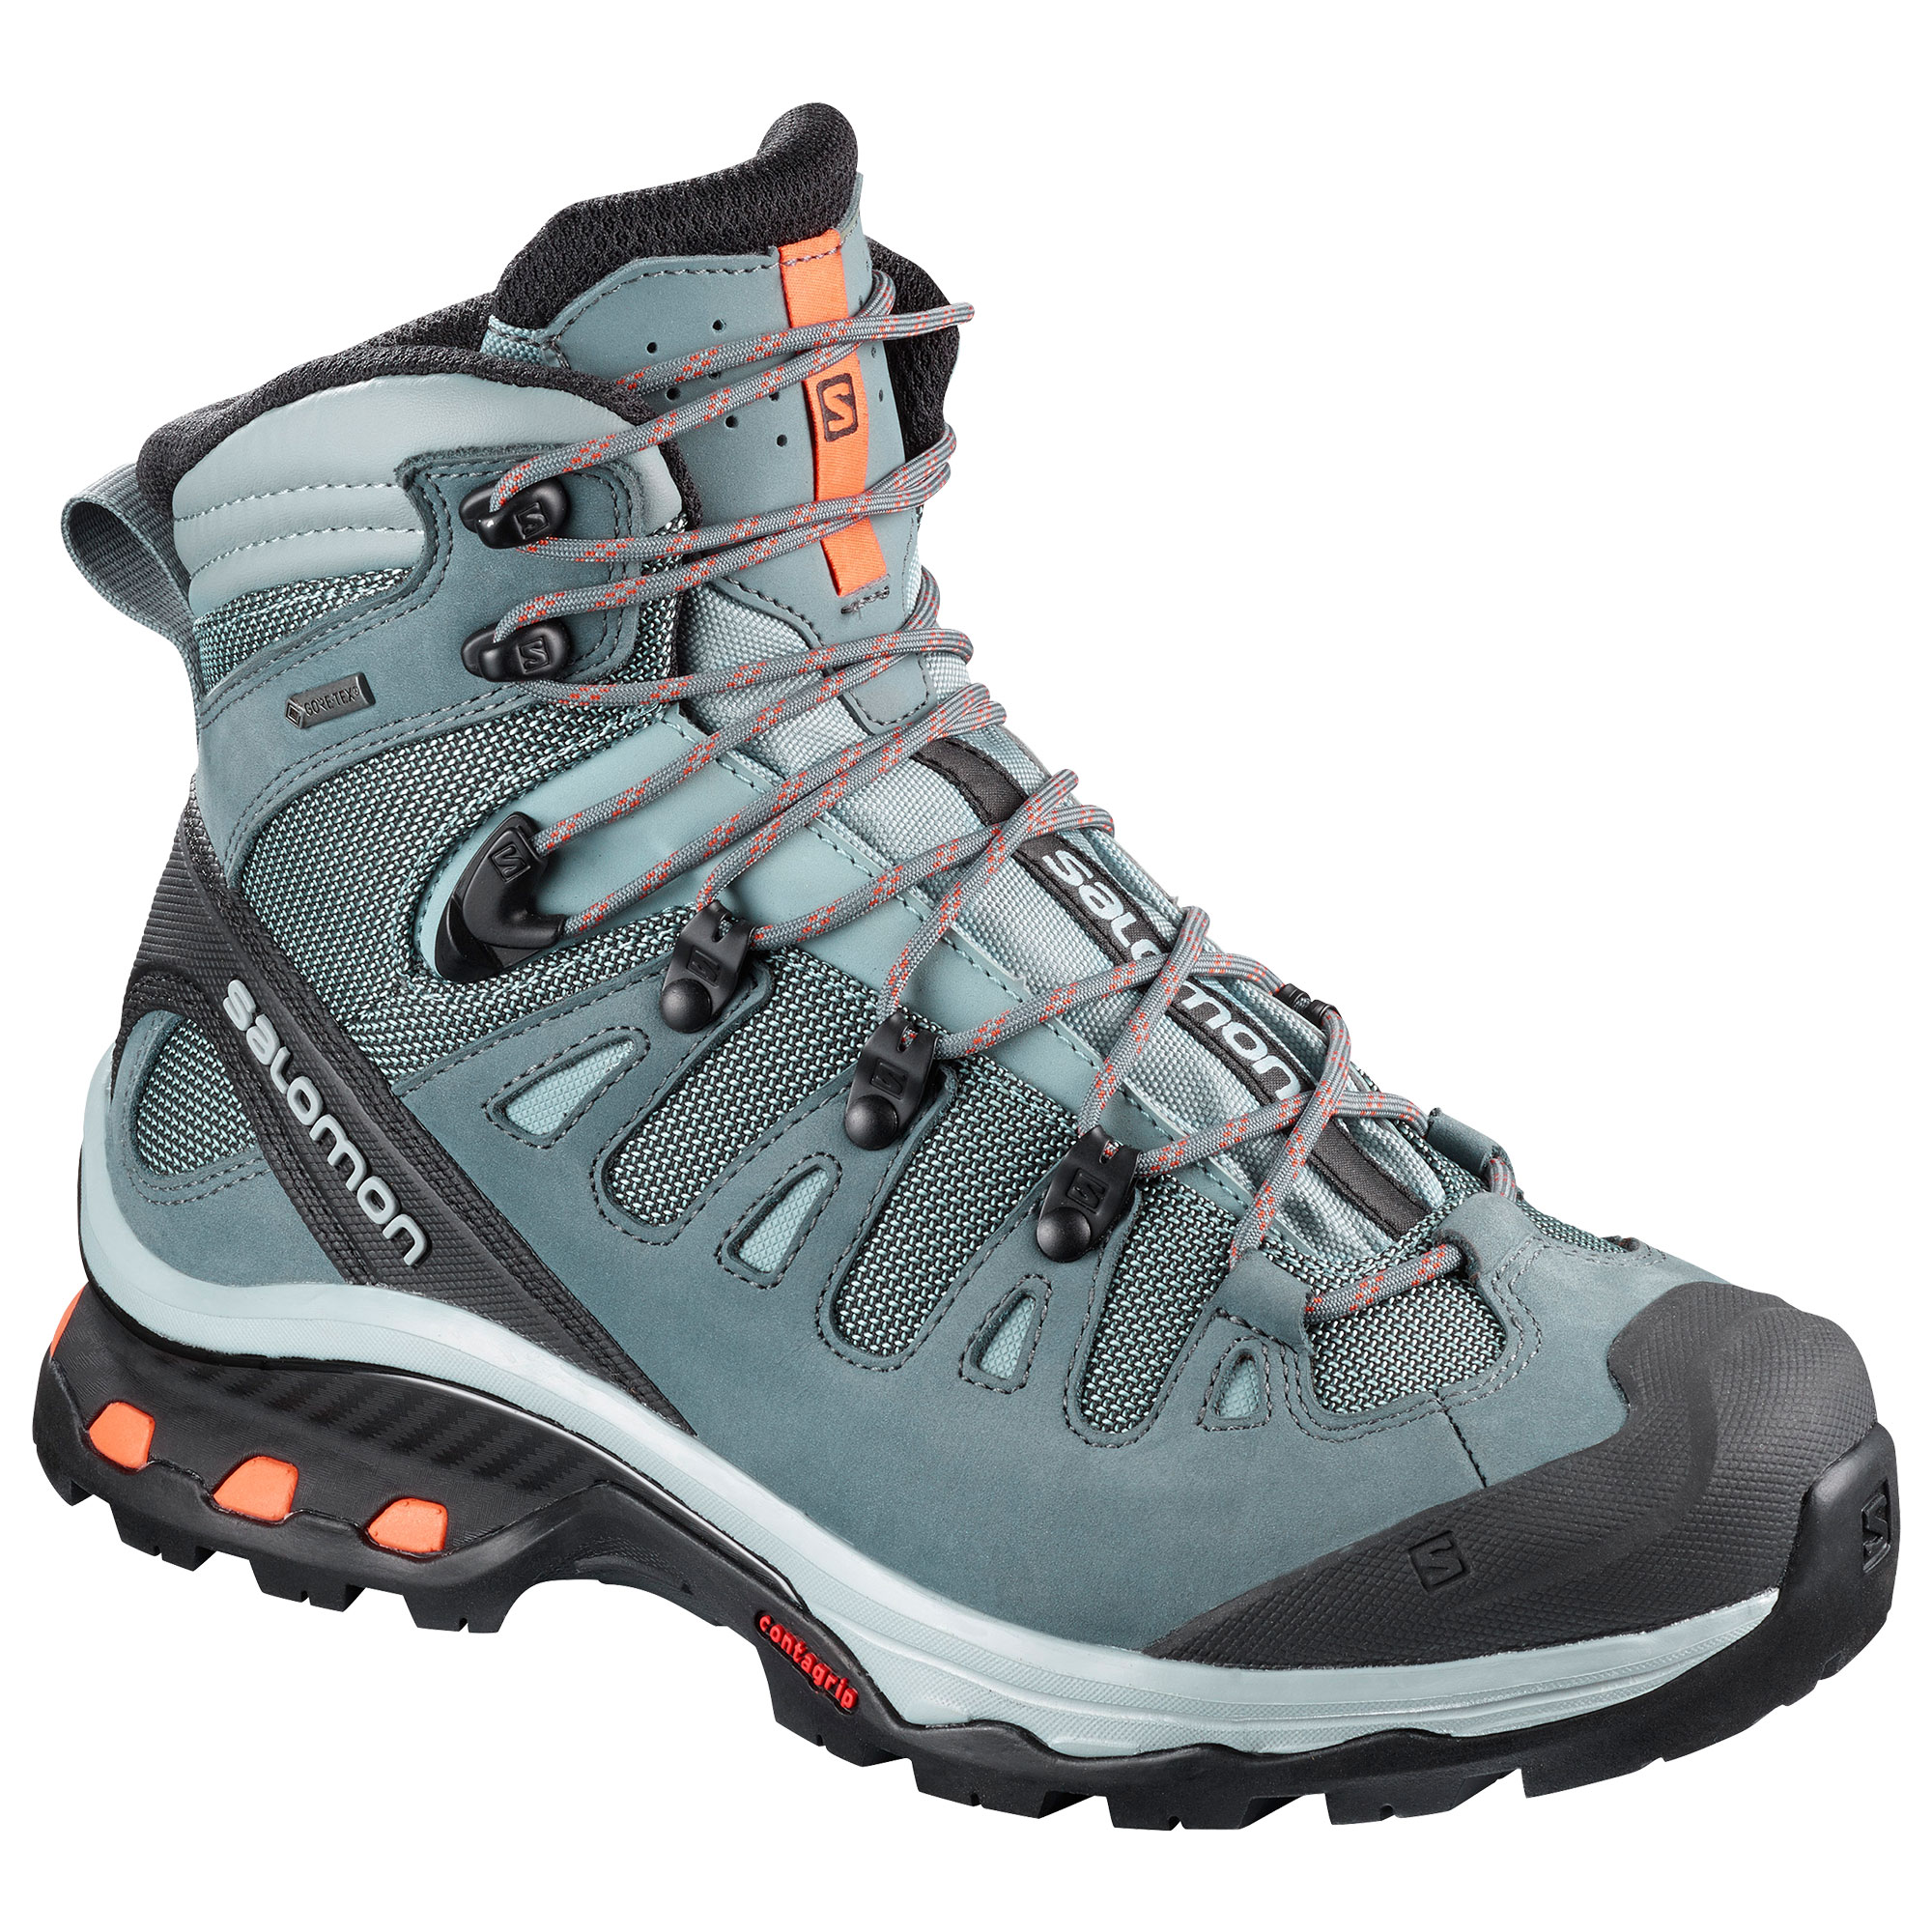 Salomon Quest 4D 3 GTX  Women's Hiking Boots in Grey/Orange